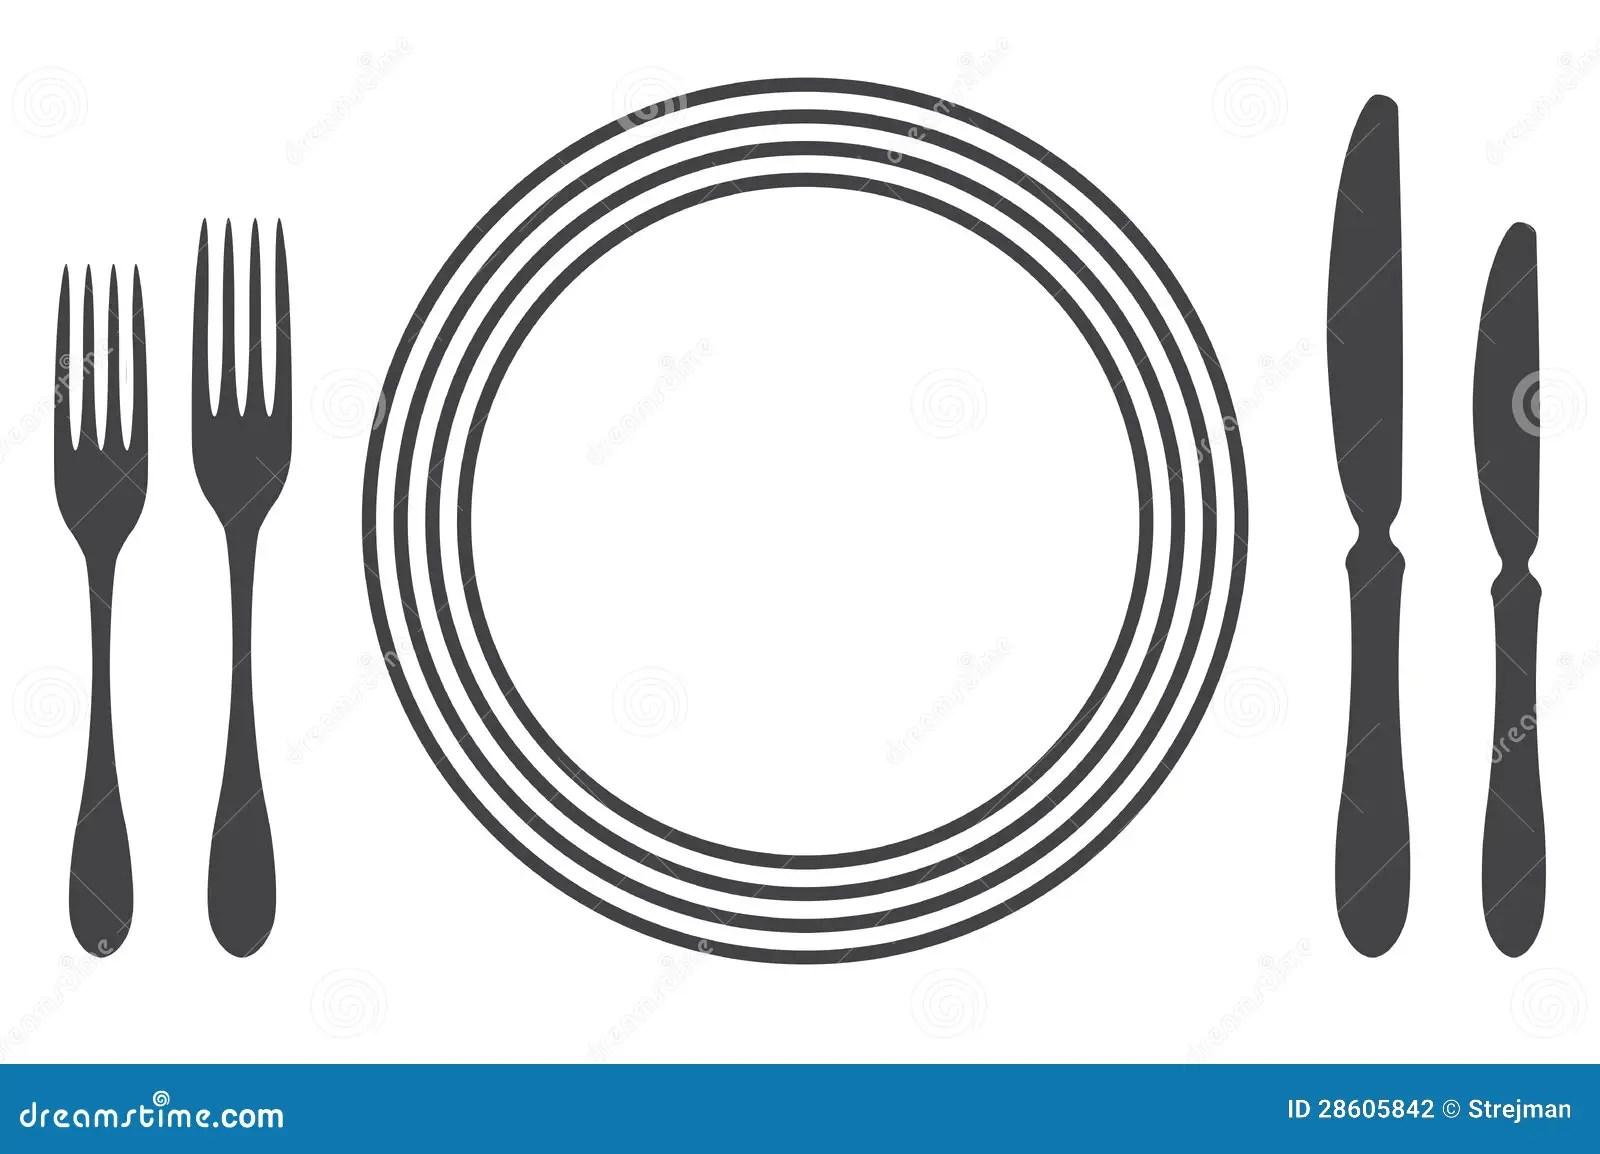 Etiquette Proper Table Setting Stock Vector